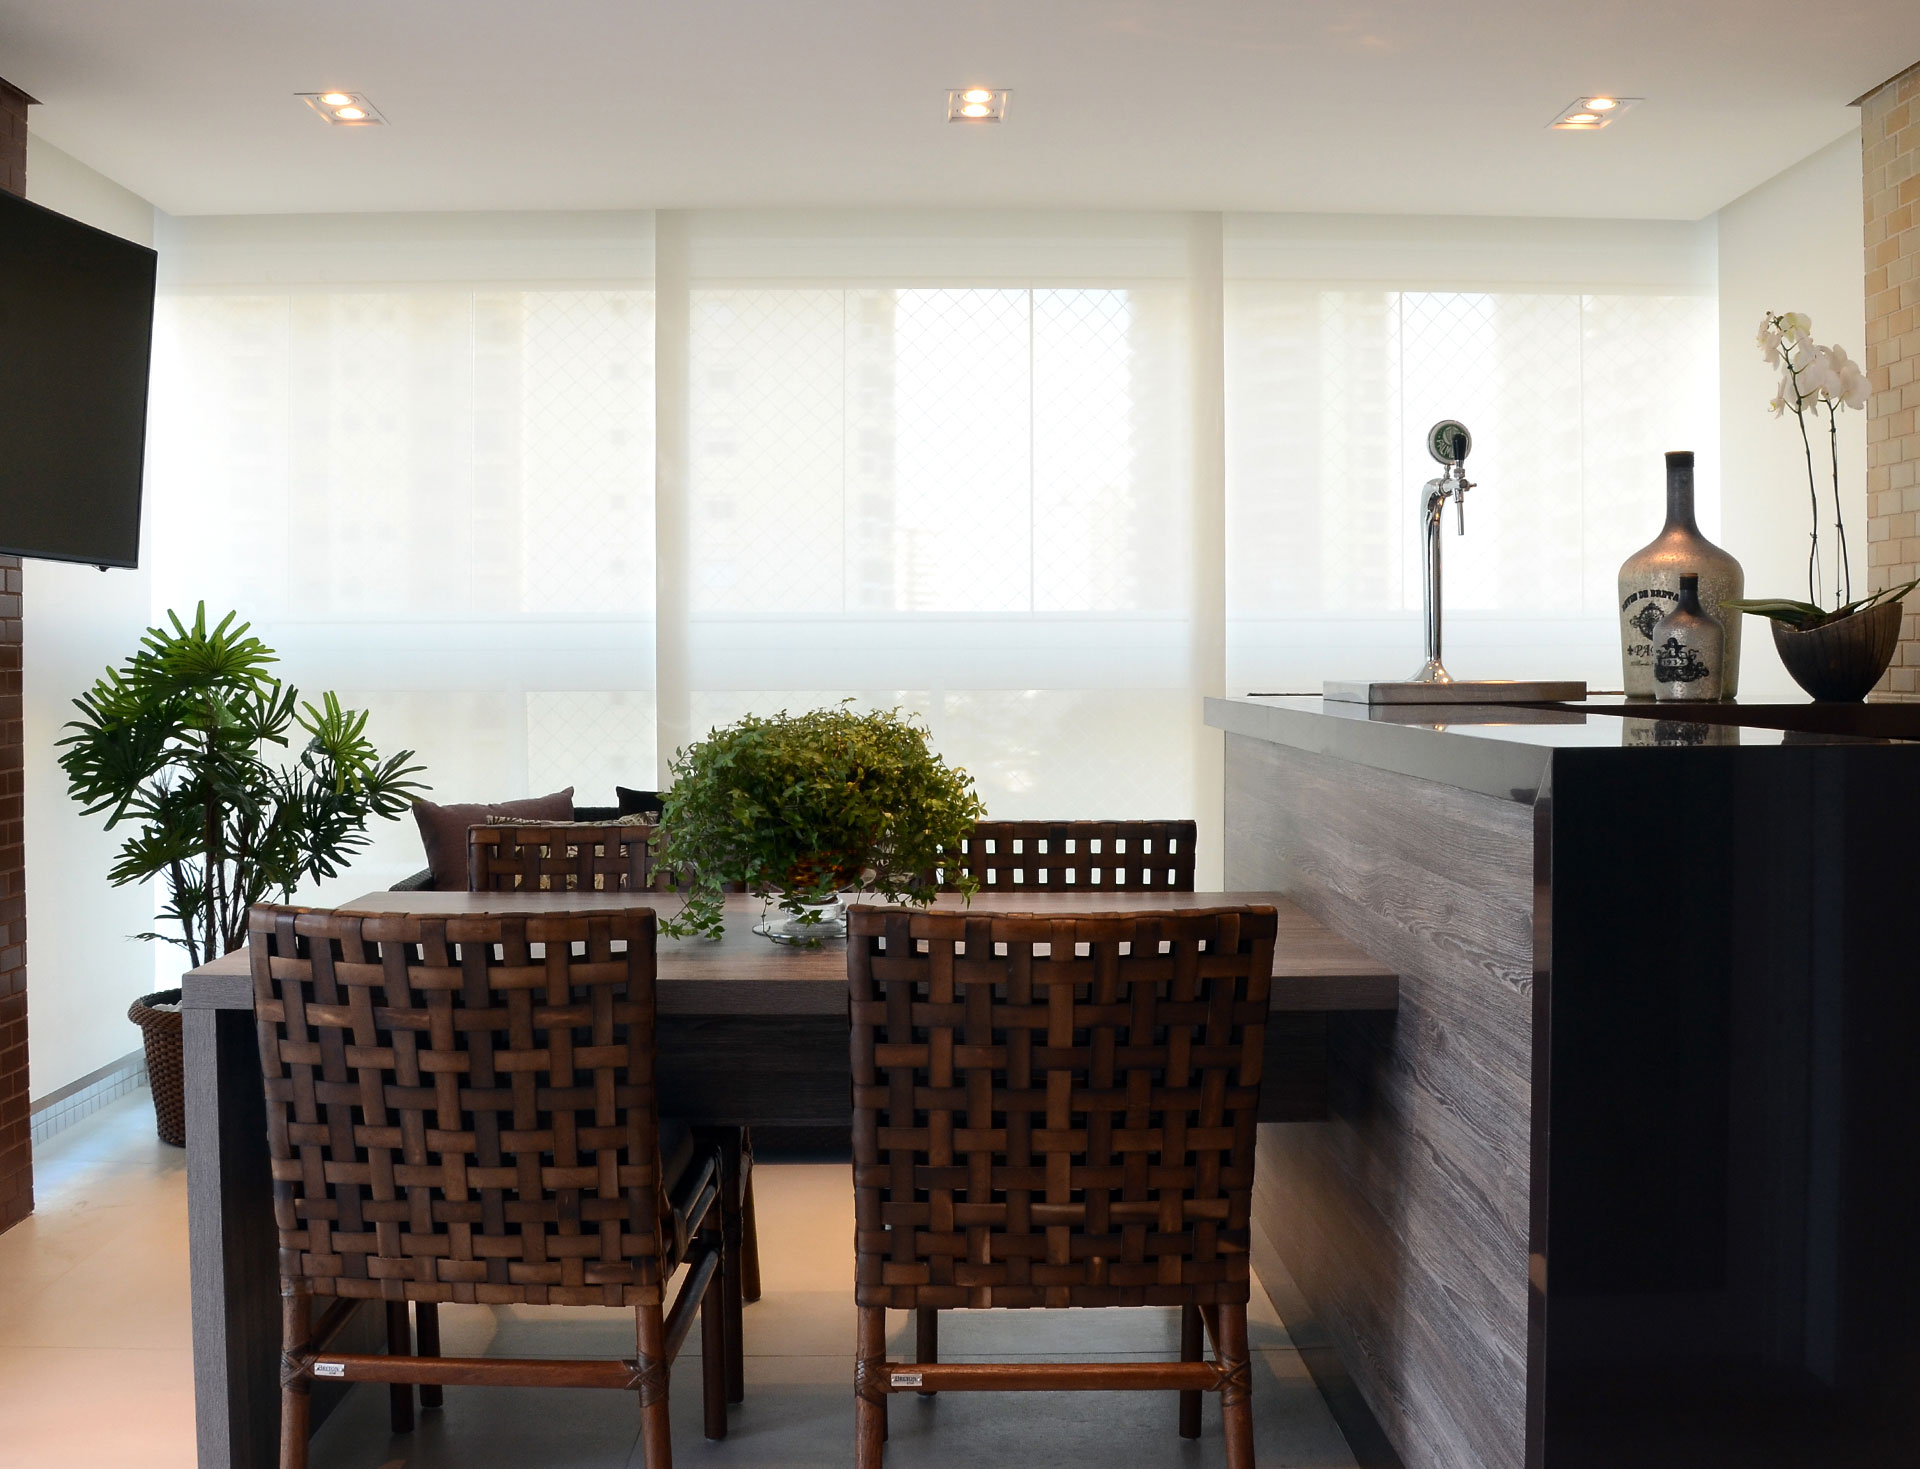 portfolio-cynthia-rolnik-apartamento2-066